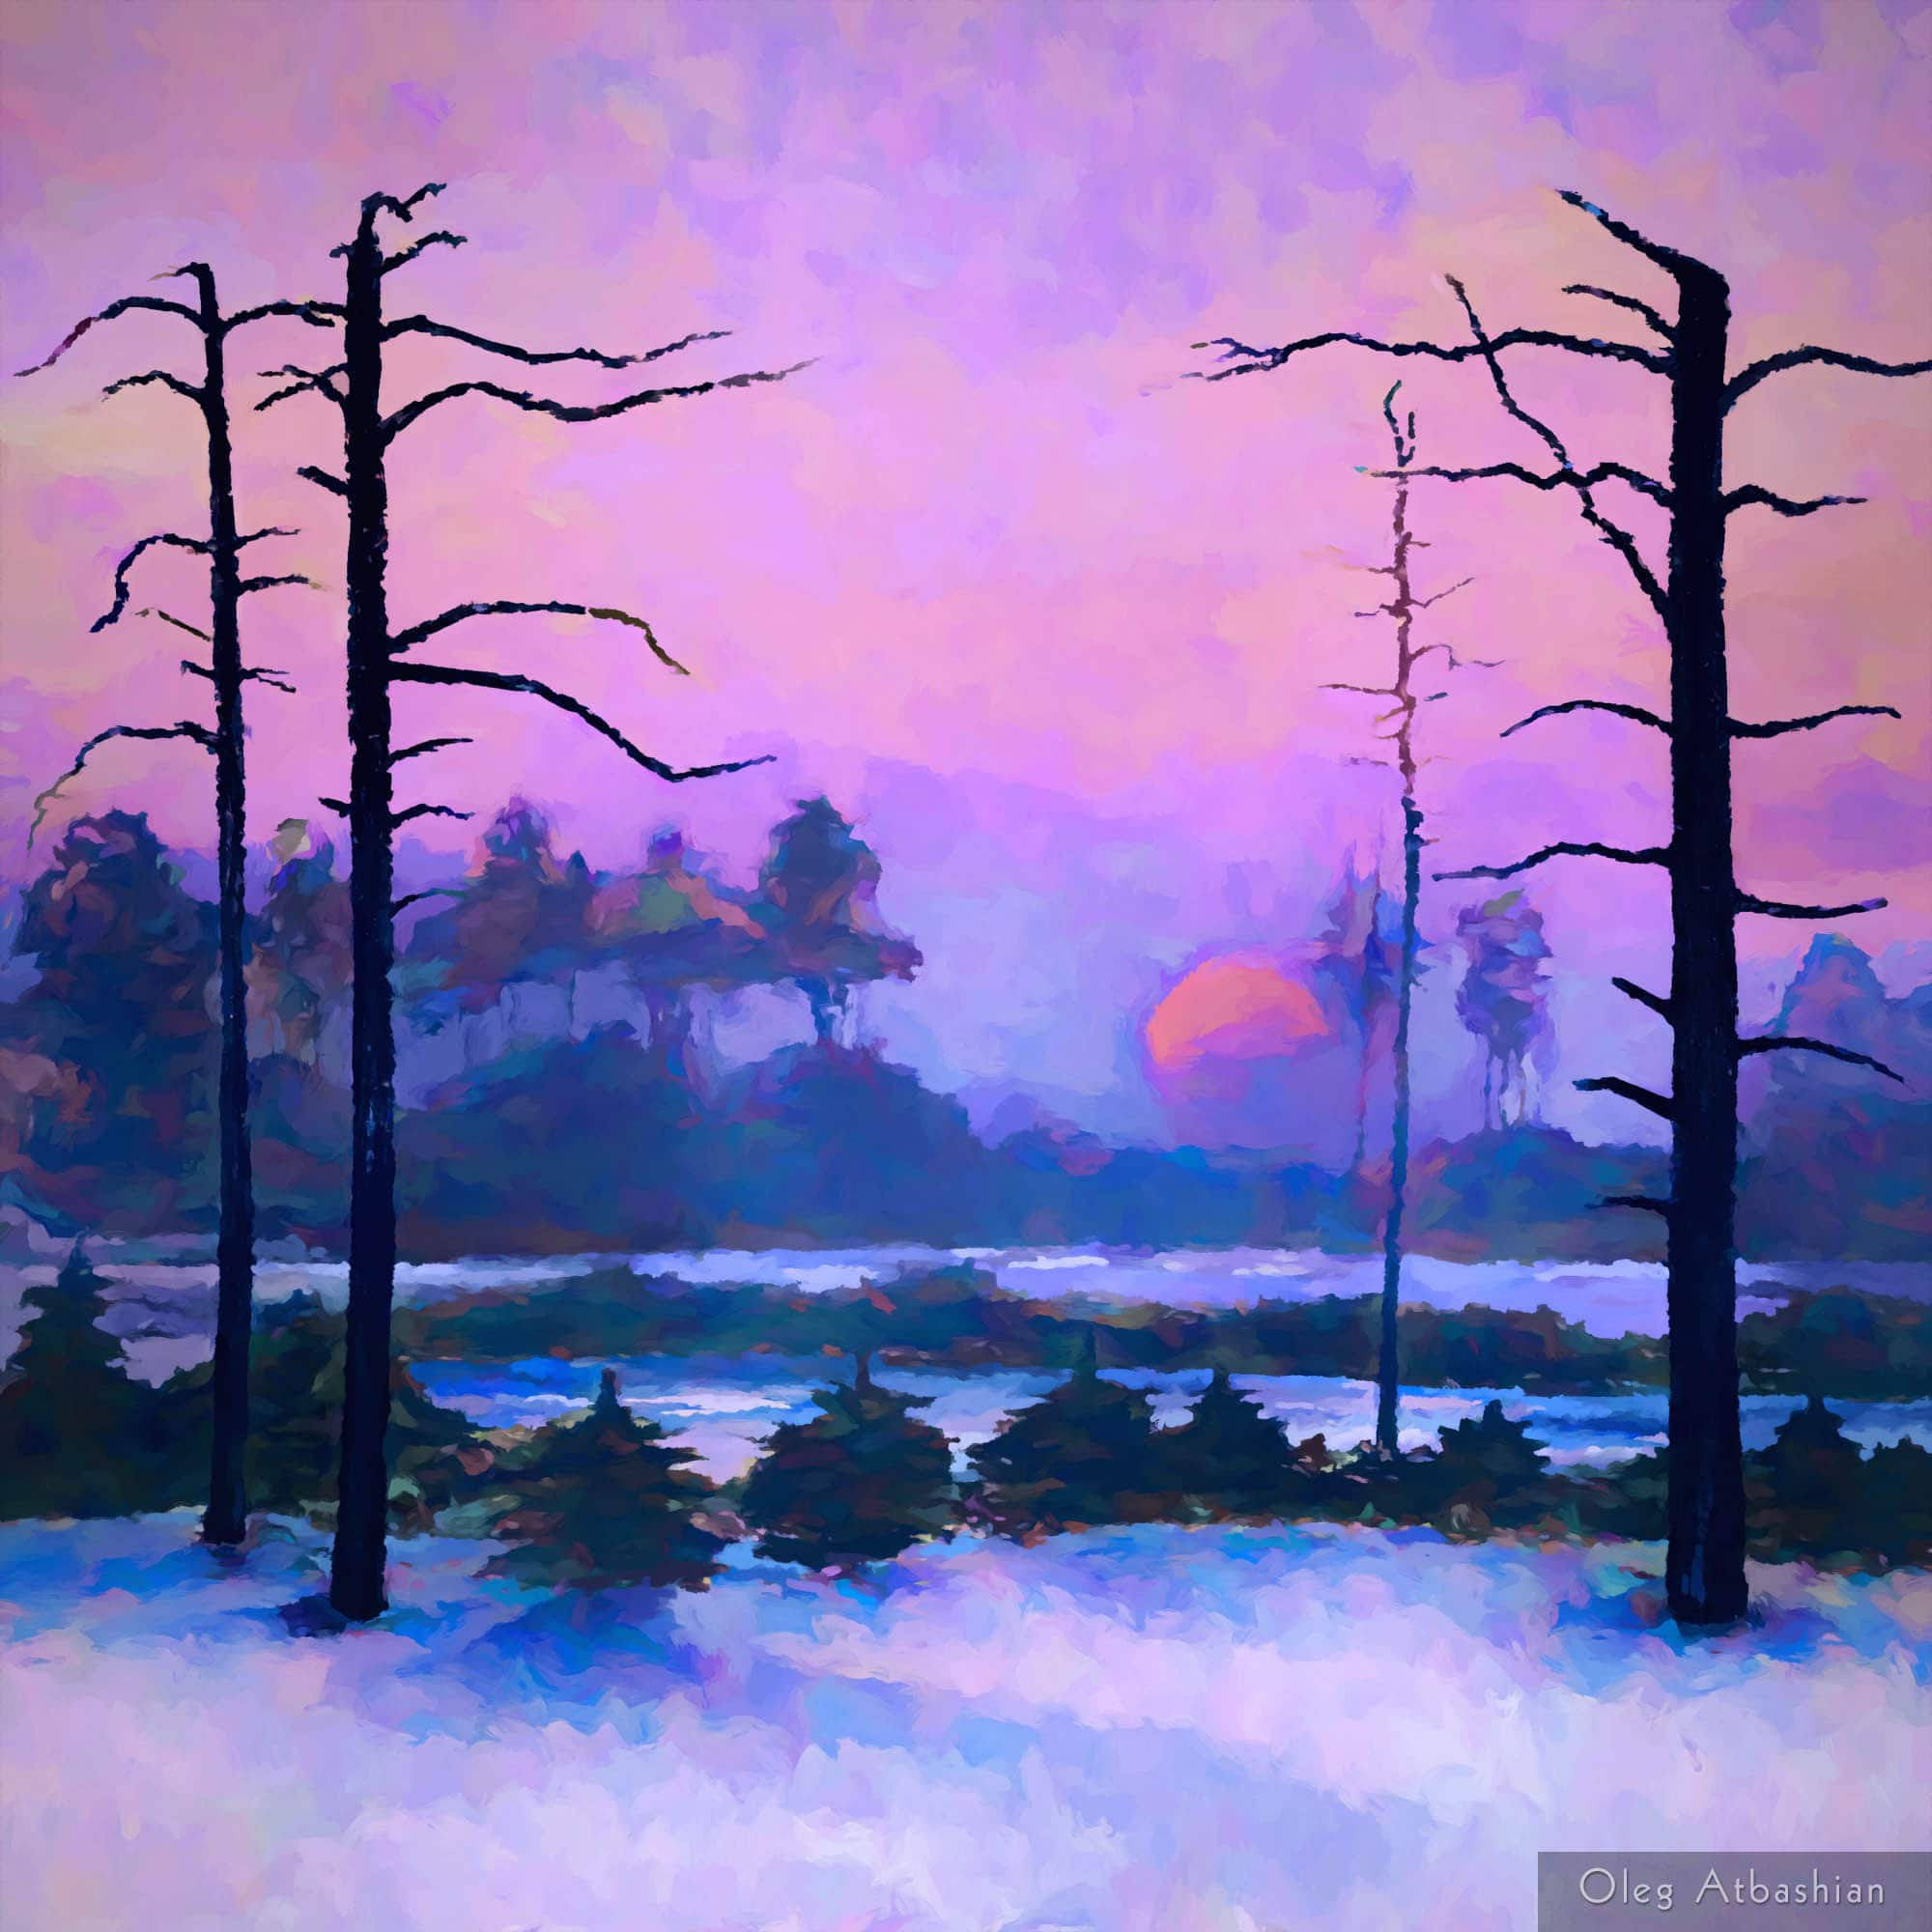 Winter Sunset in Siberia